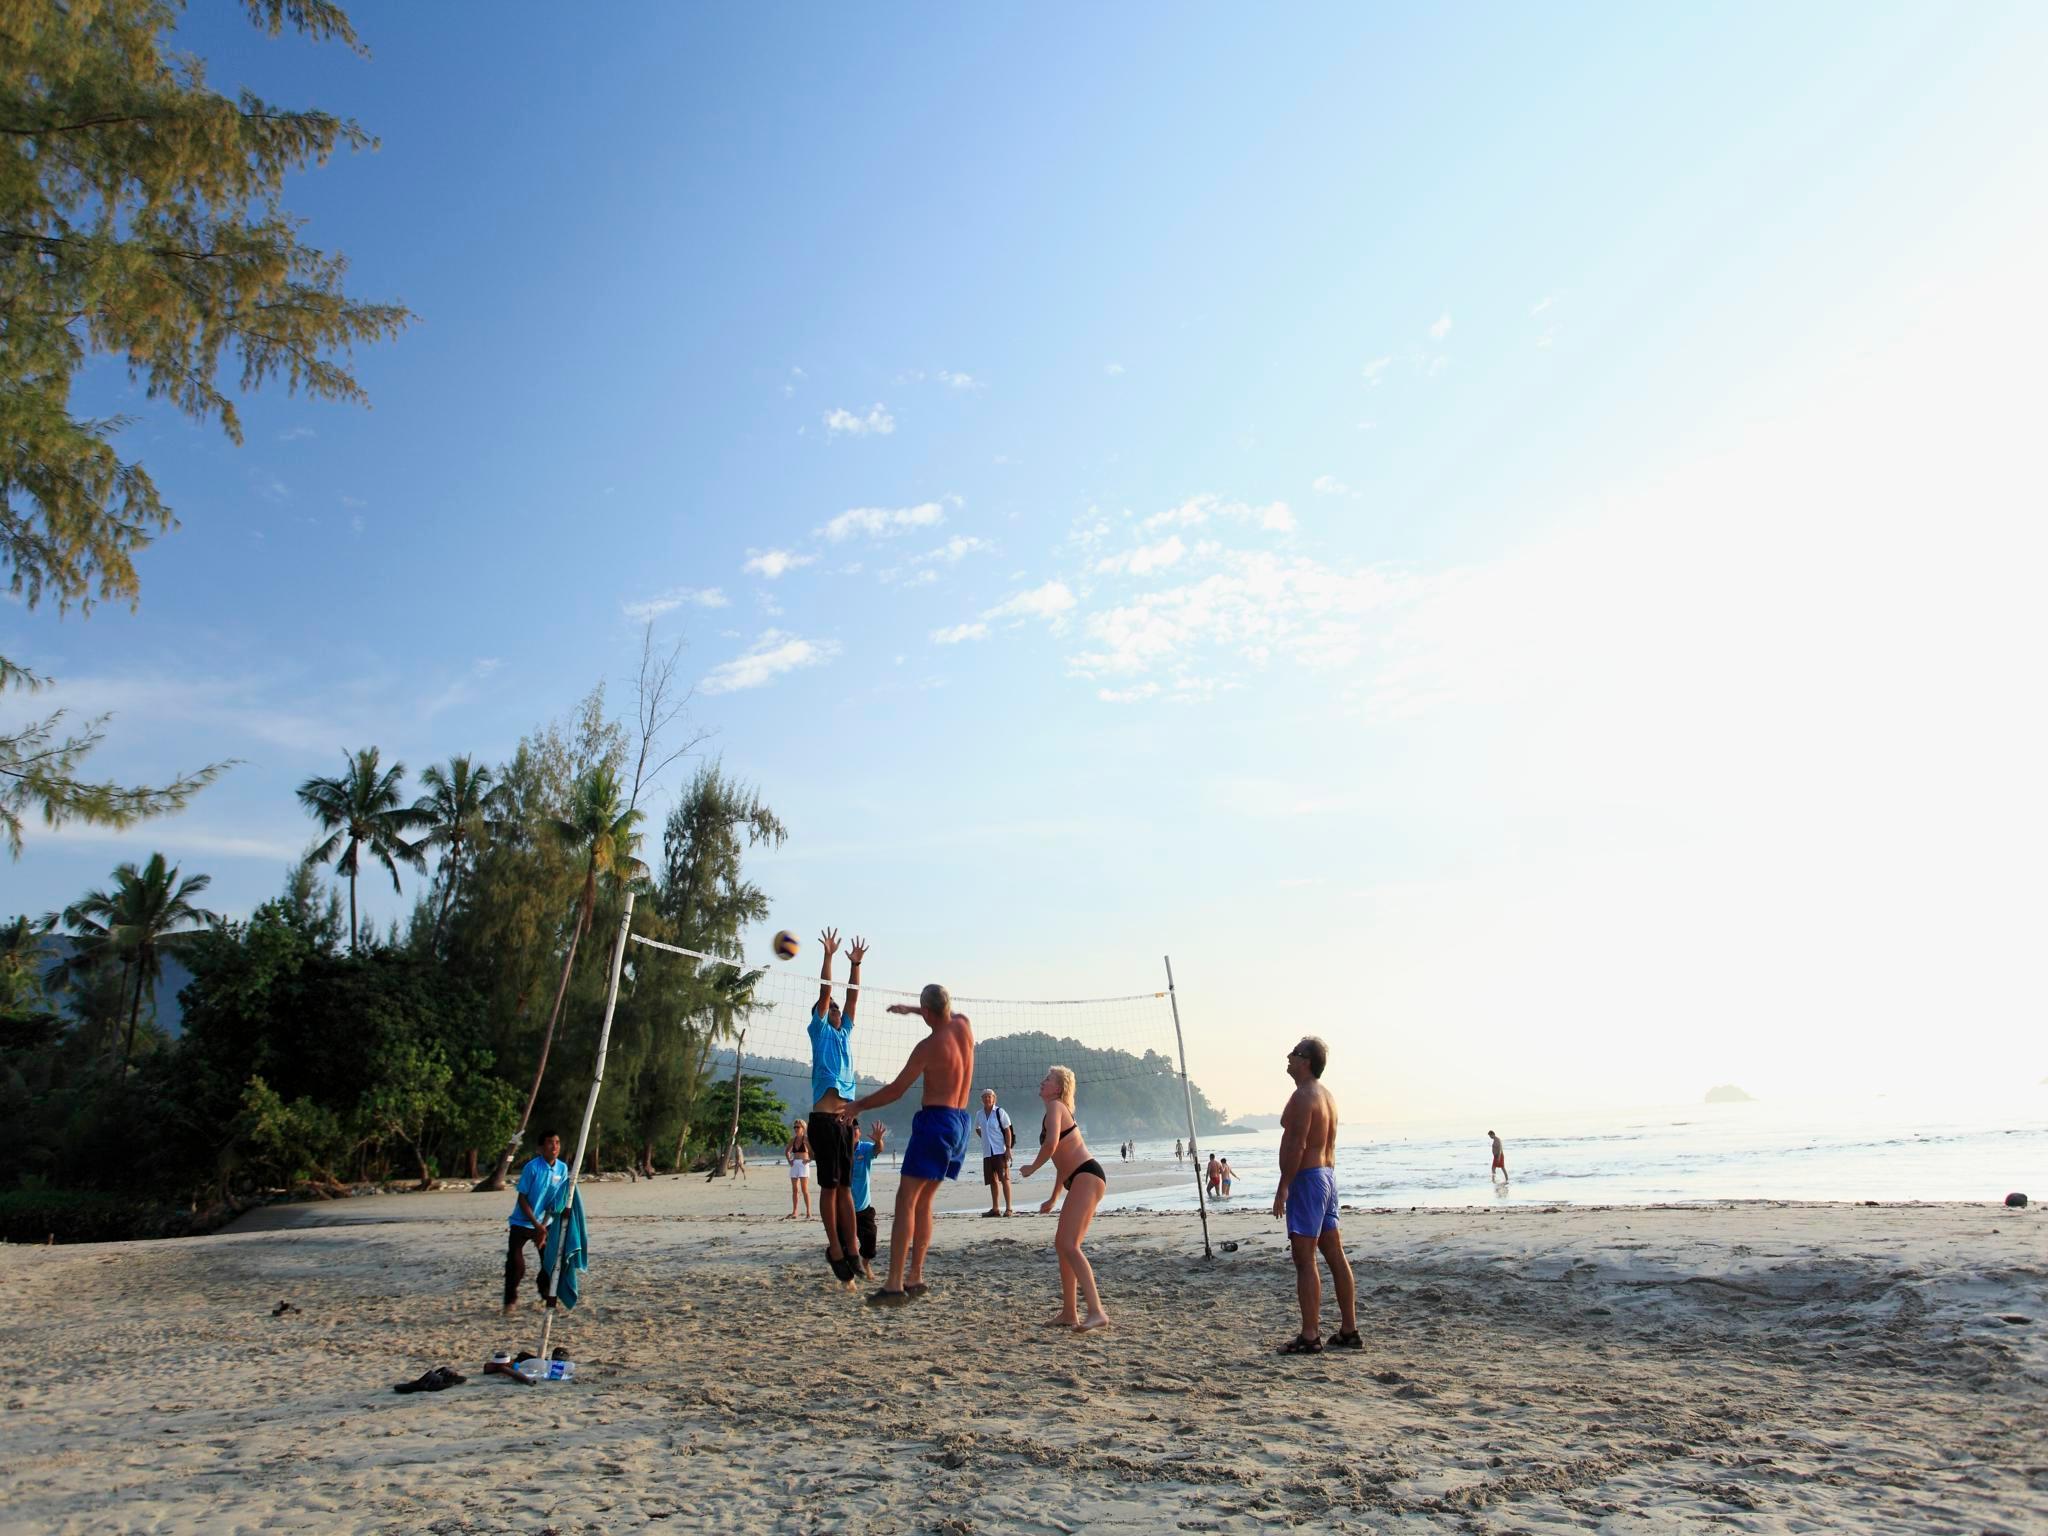 Centara Koh Chang Tropicana Resort เซ็นทารา เกาะช้าง ทรอปิคานา รีสอร์ท